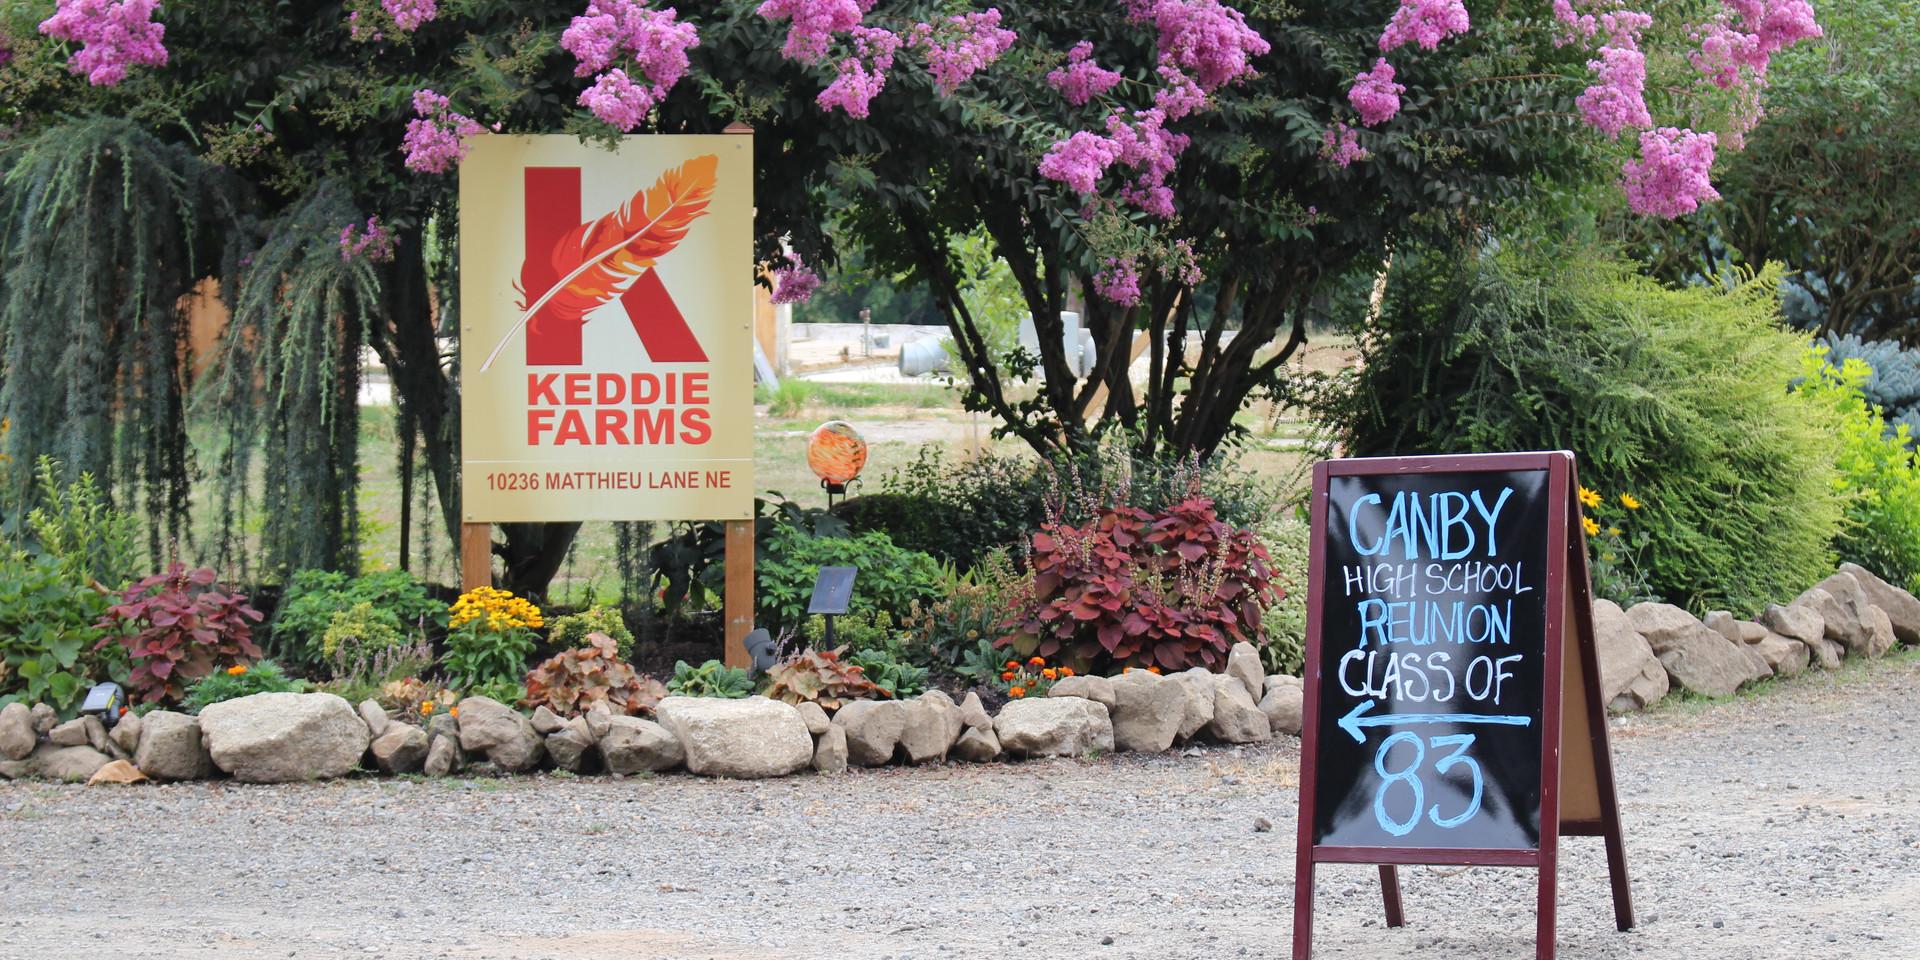 Entrance to Keddie Farms